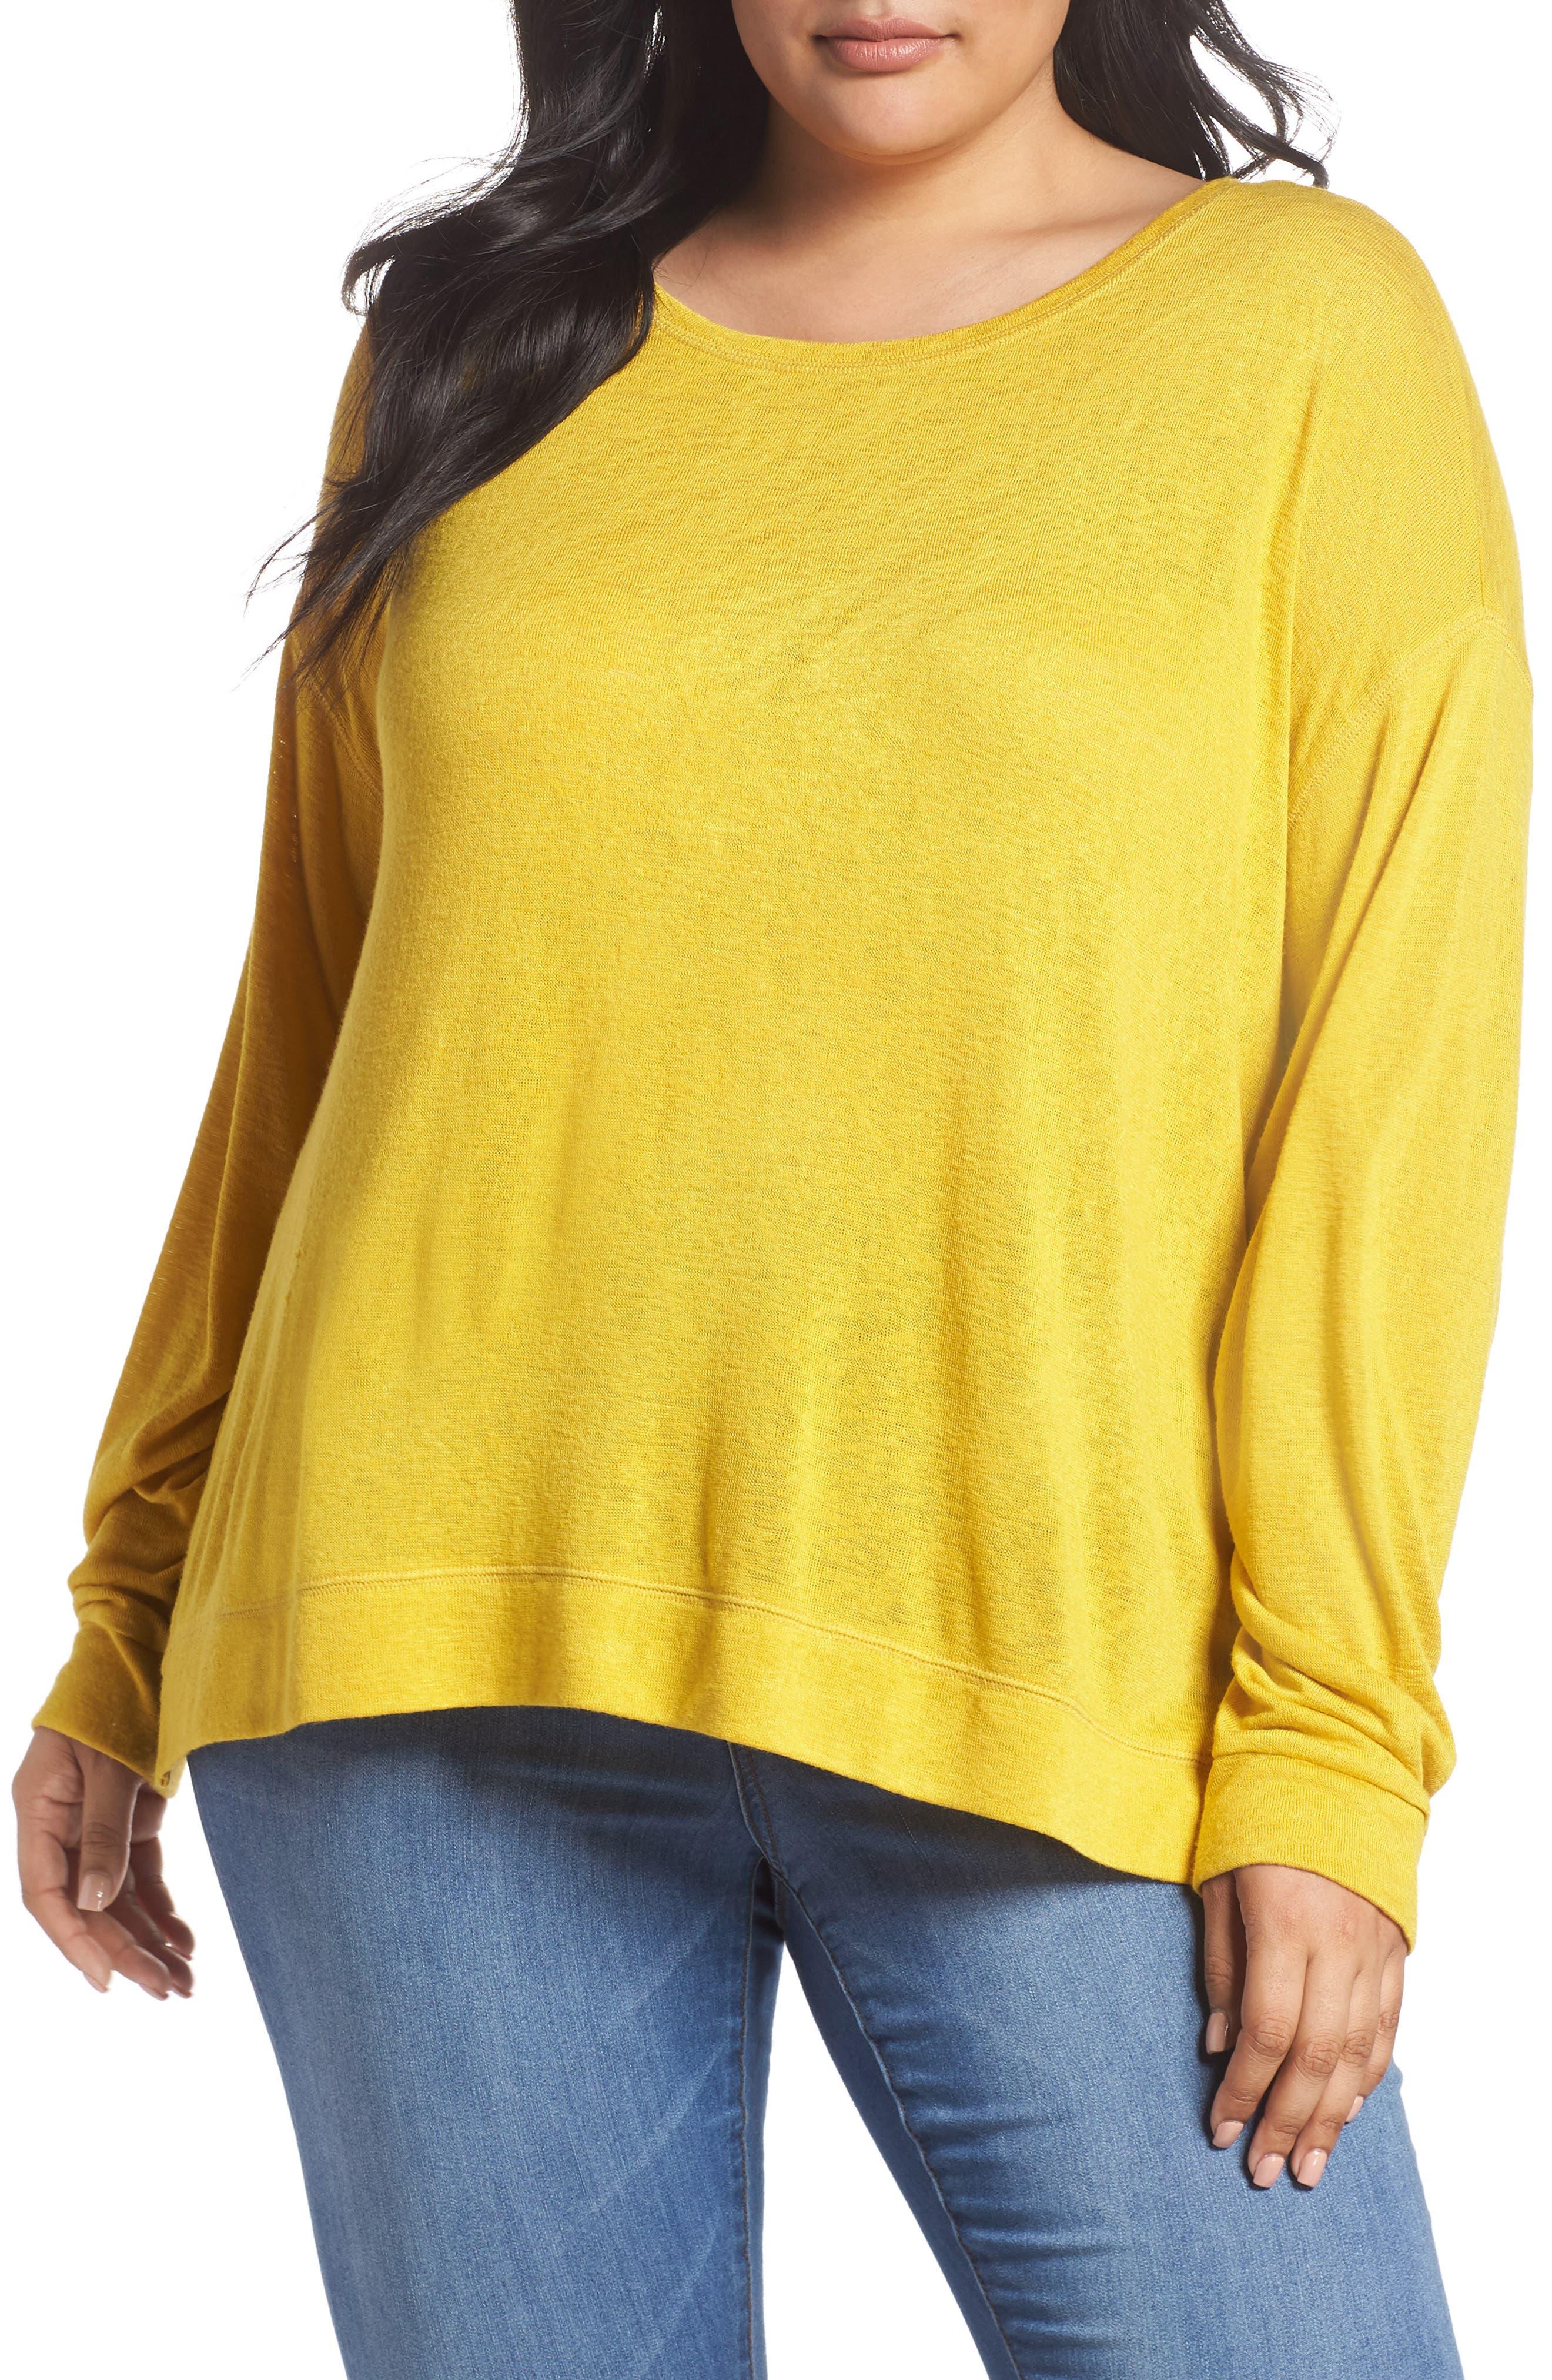 Tuck Sleeve Sweatshirt,                             Main thumbnail 1, color,                             Yellow Tea